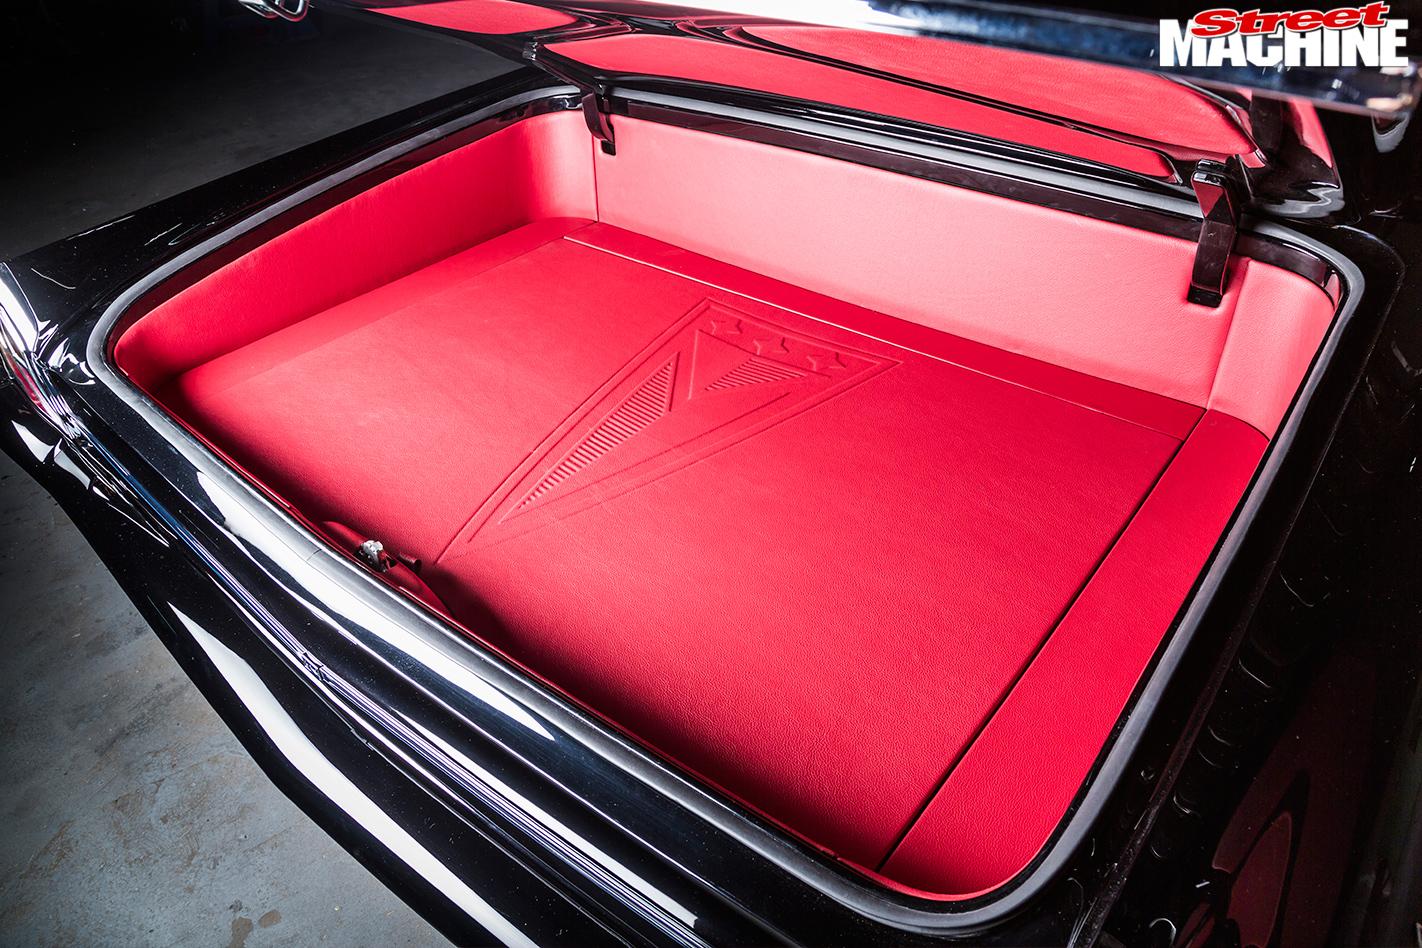 Pontiac -Laurentian -boot -2